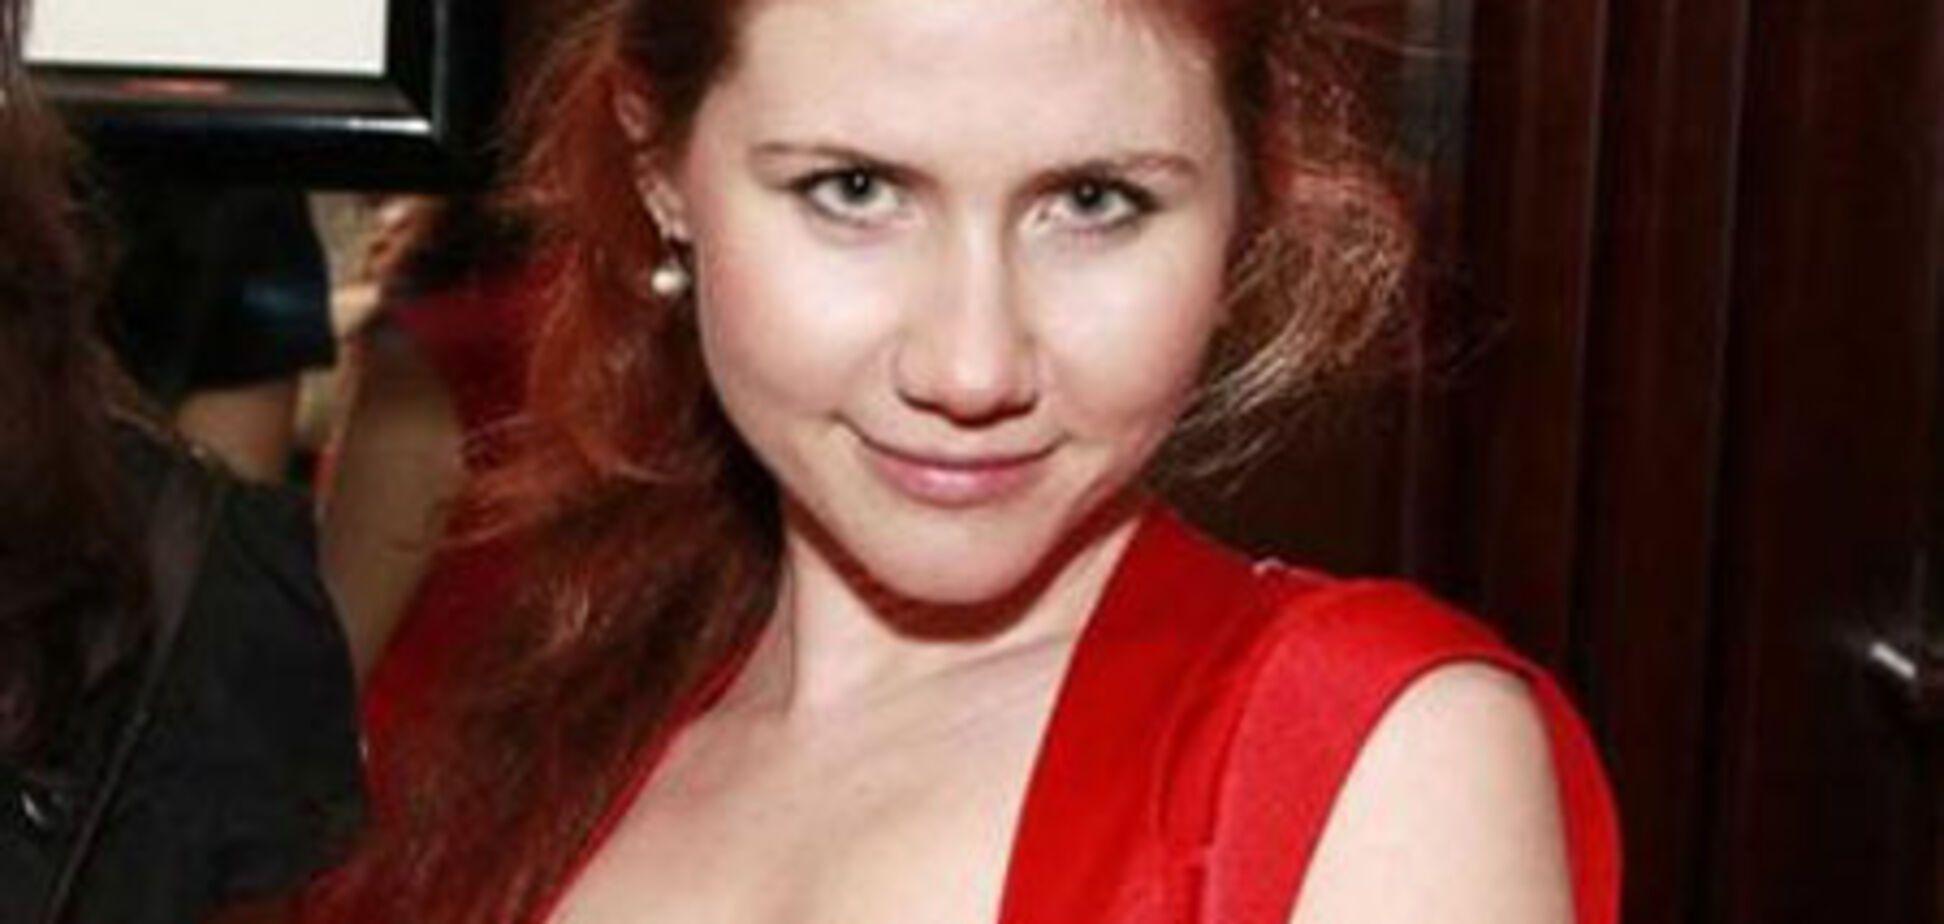 Анна Чапман стане телеведучою